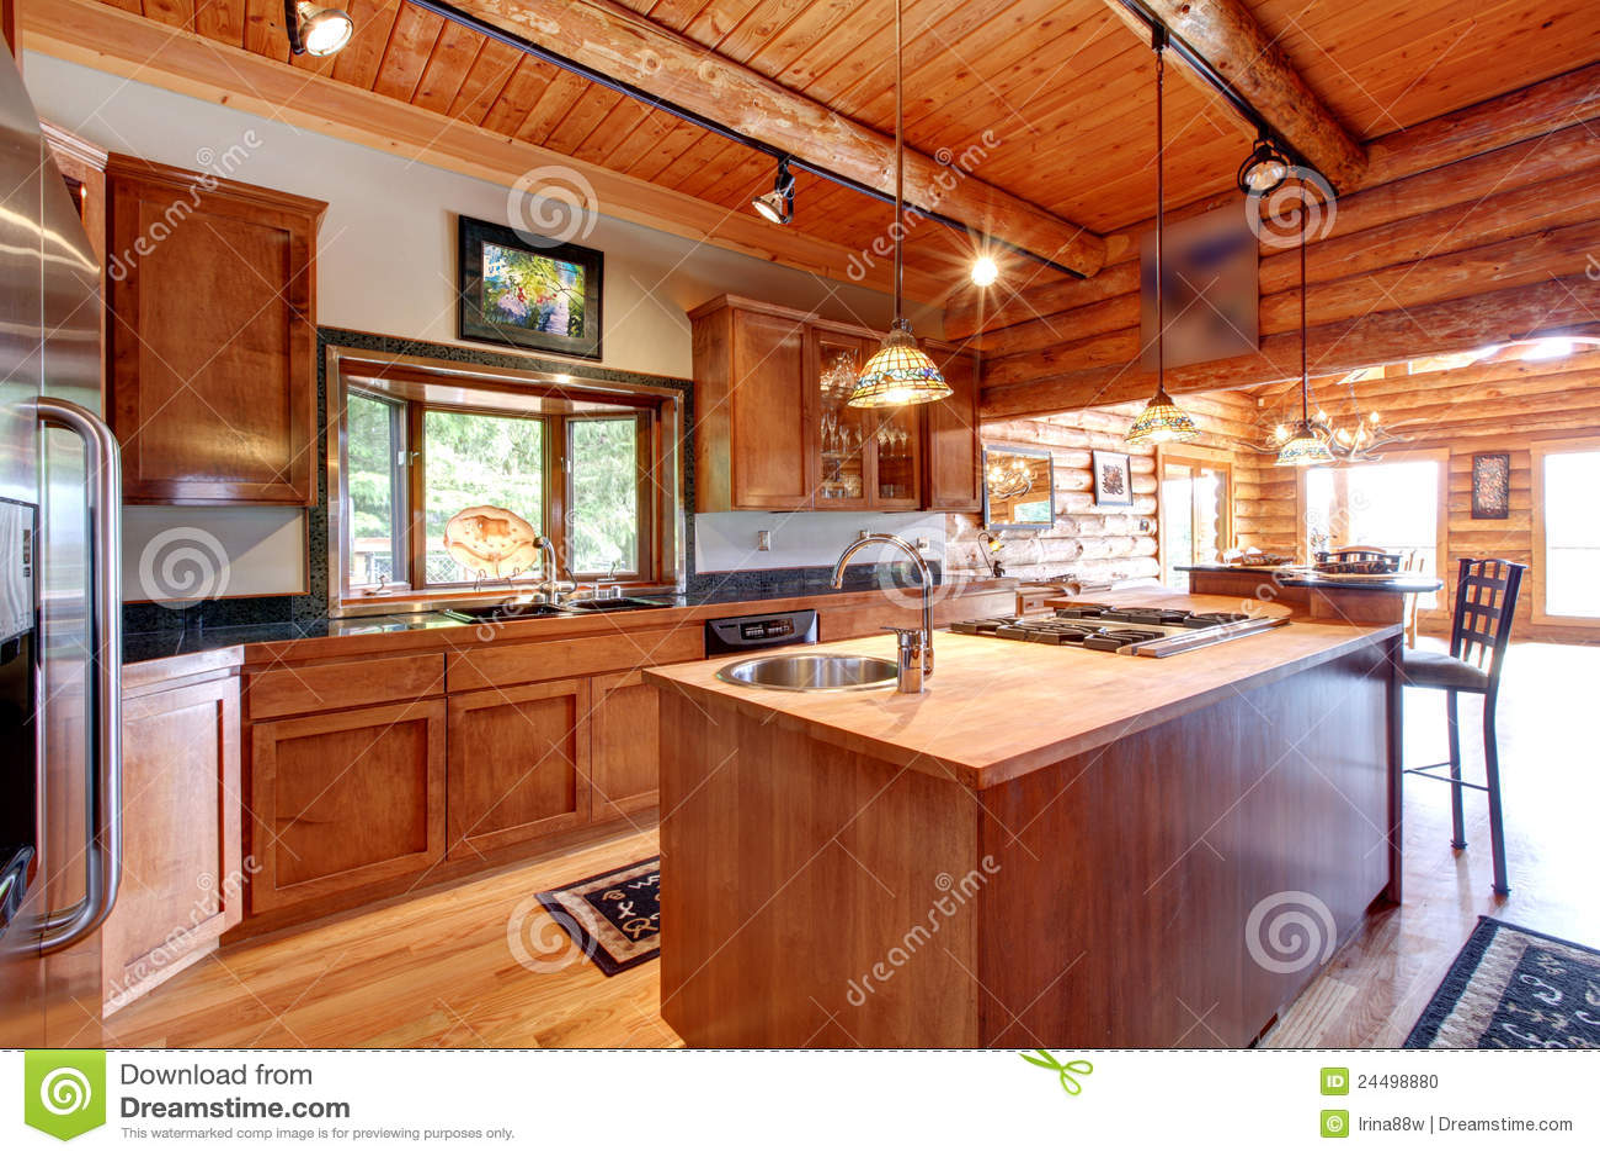 Log Cabin Large Kitchen Interior Stock Photo  Image